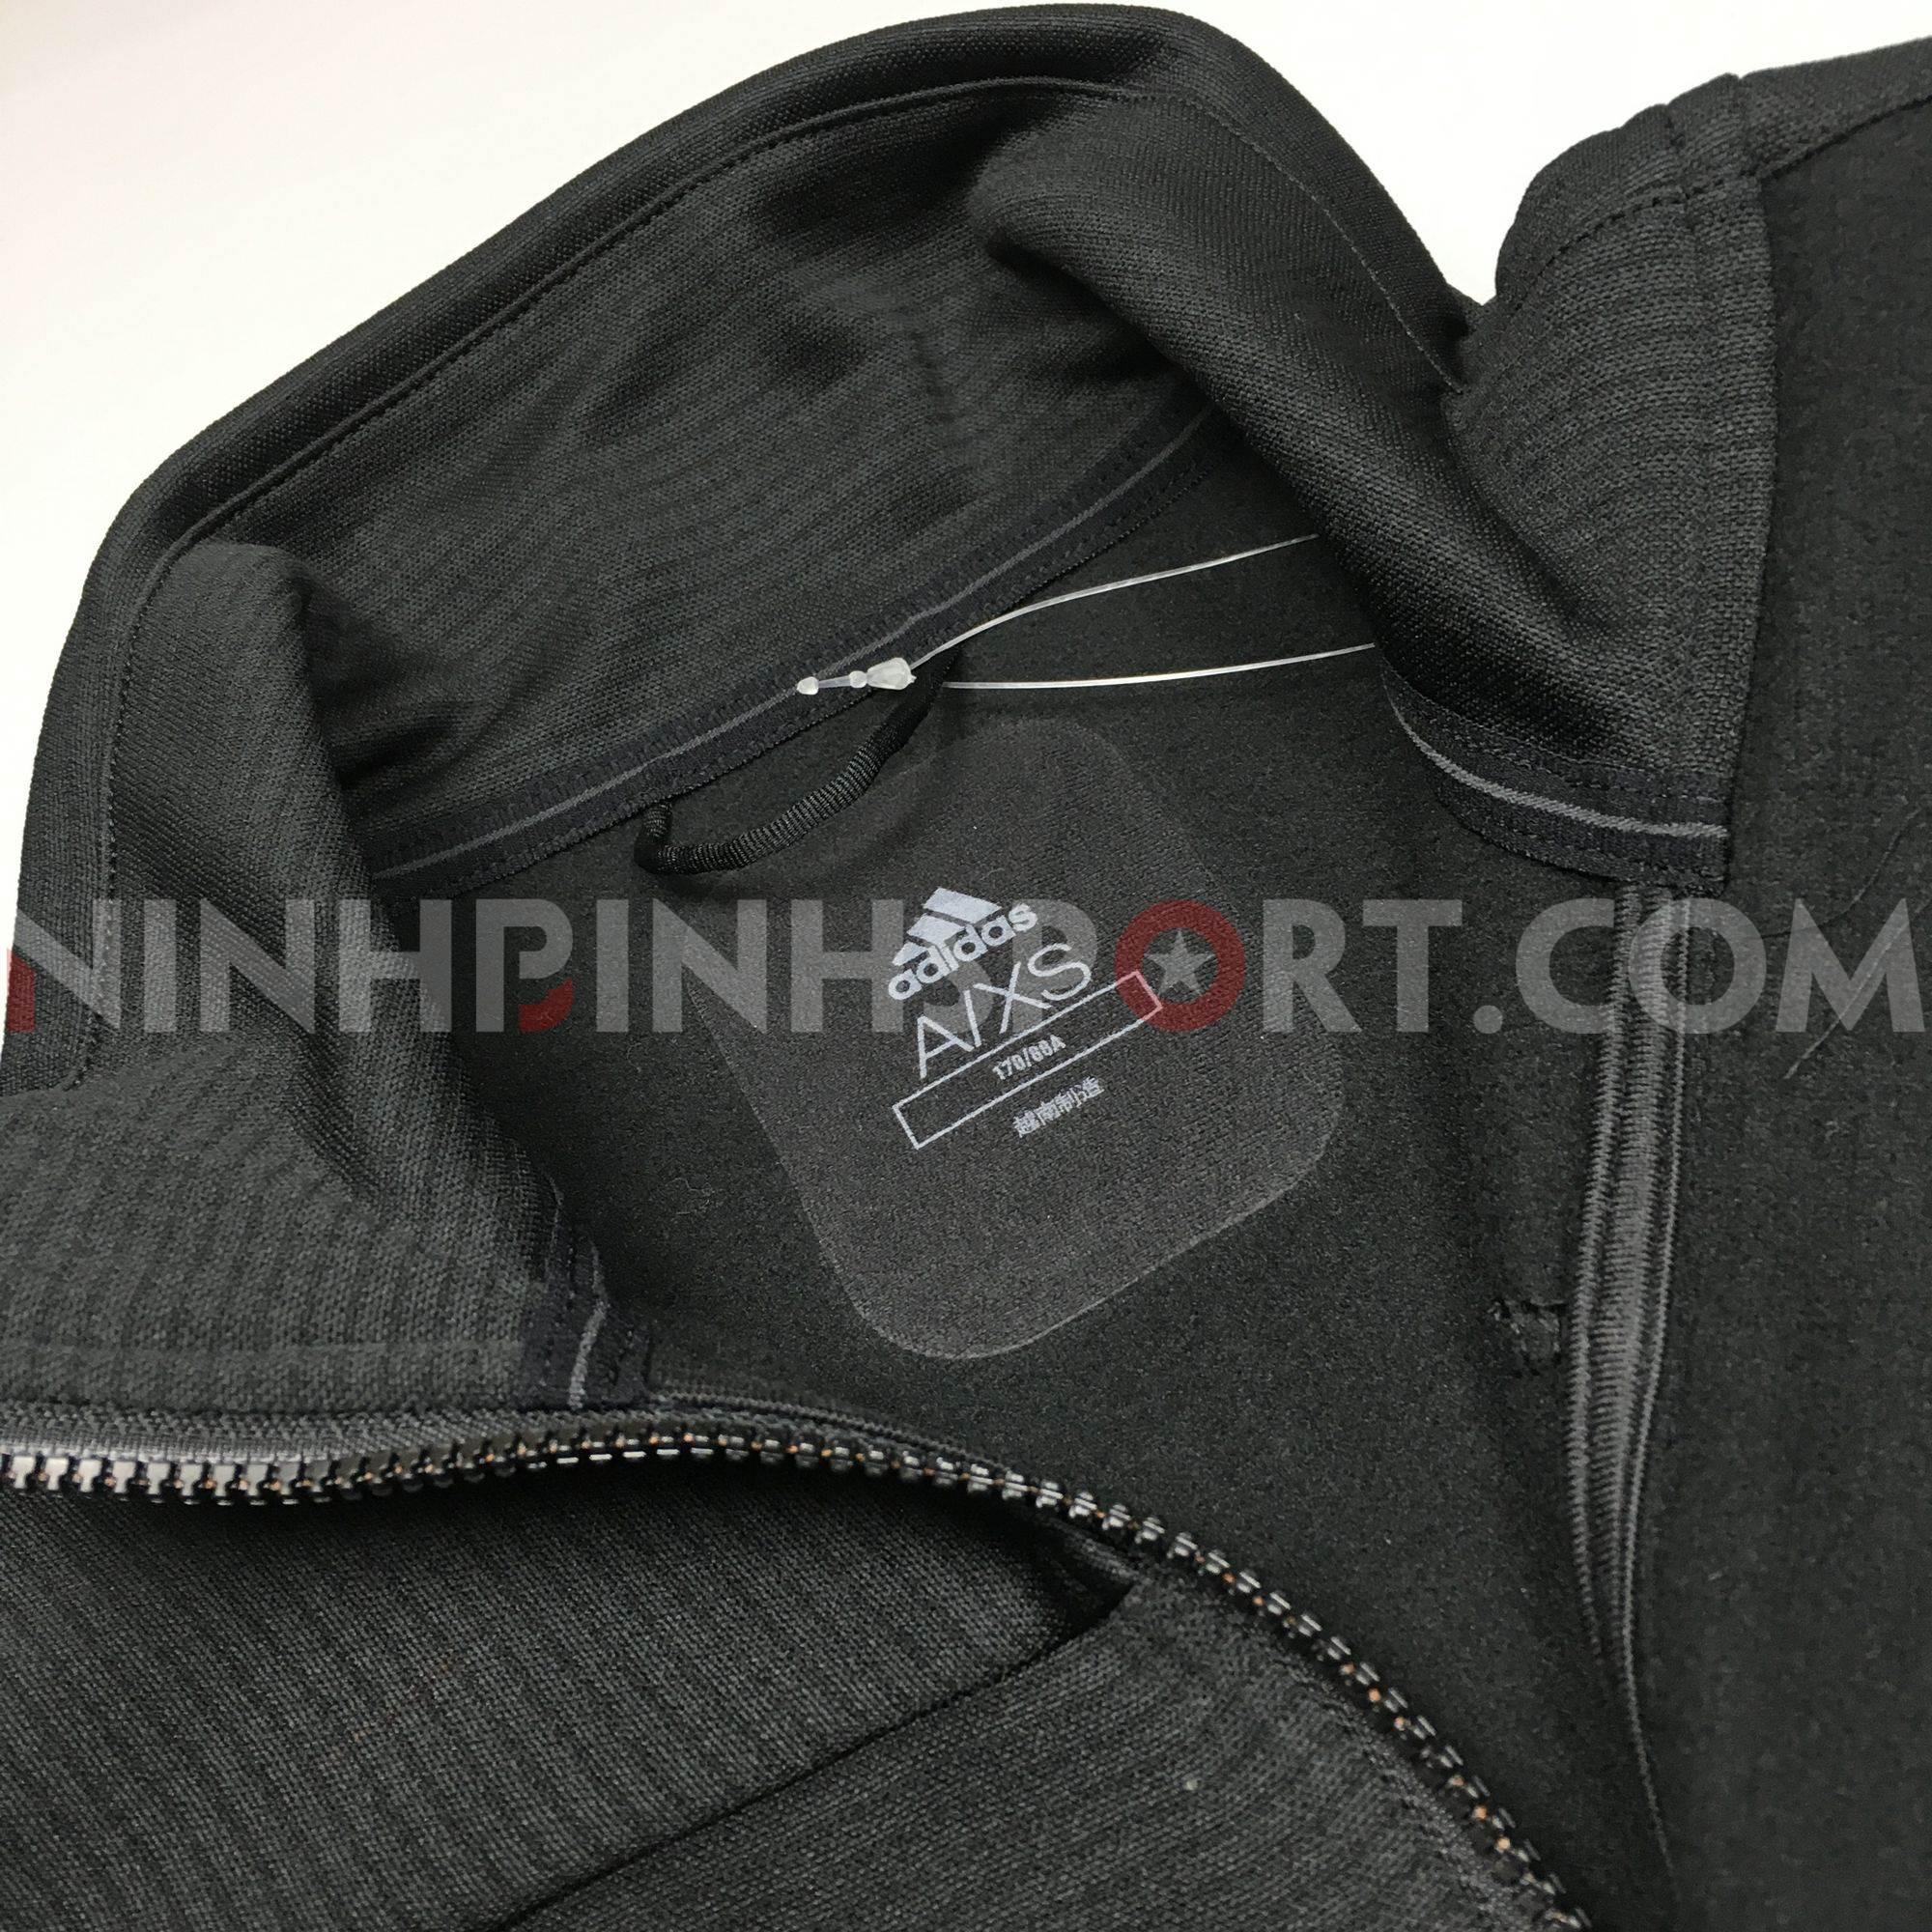 Áo khoác thể thao nam Adidas Stockhorn Fleece Black - CY8684